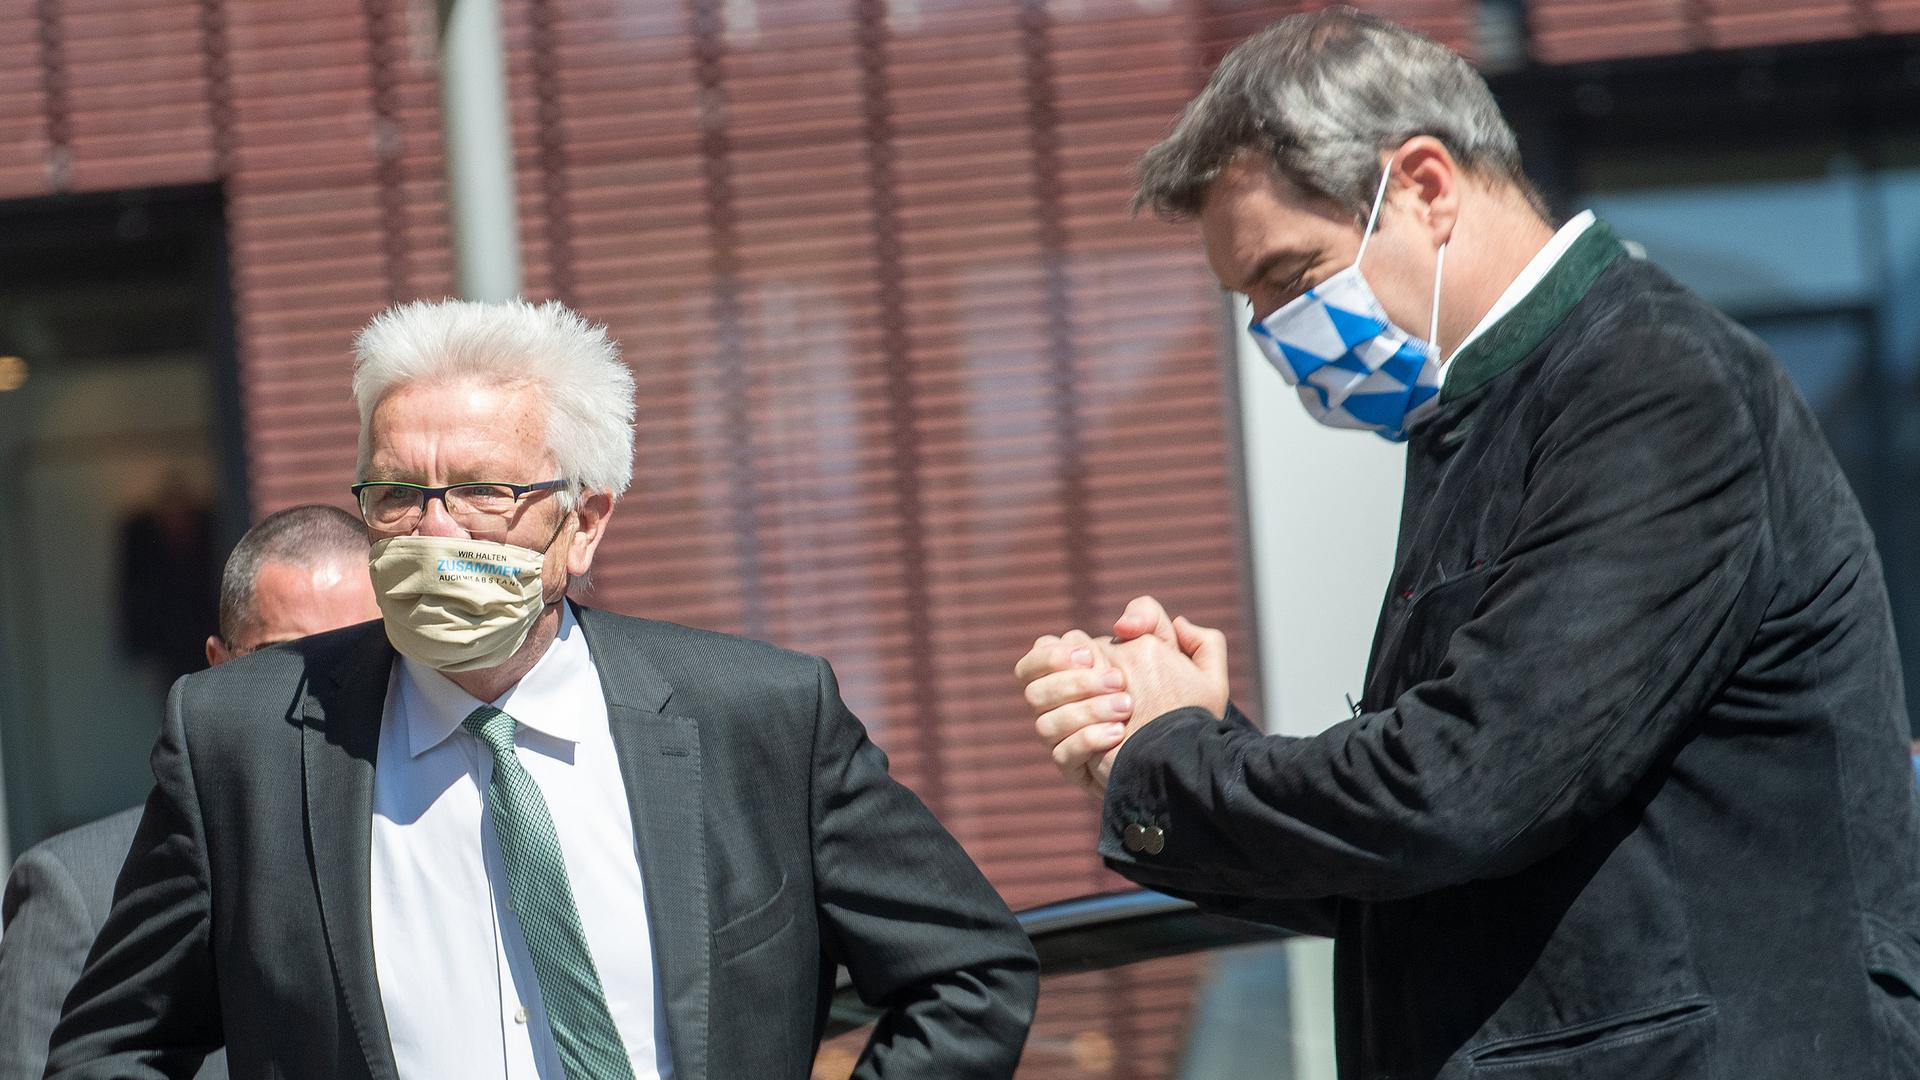 Die Ministerpräsidenten Winfried Kretschmann und Markus Söder wollen im Kampf gegen Corona an einem Strang ziehen.